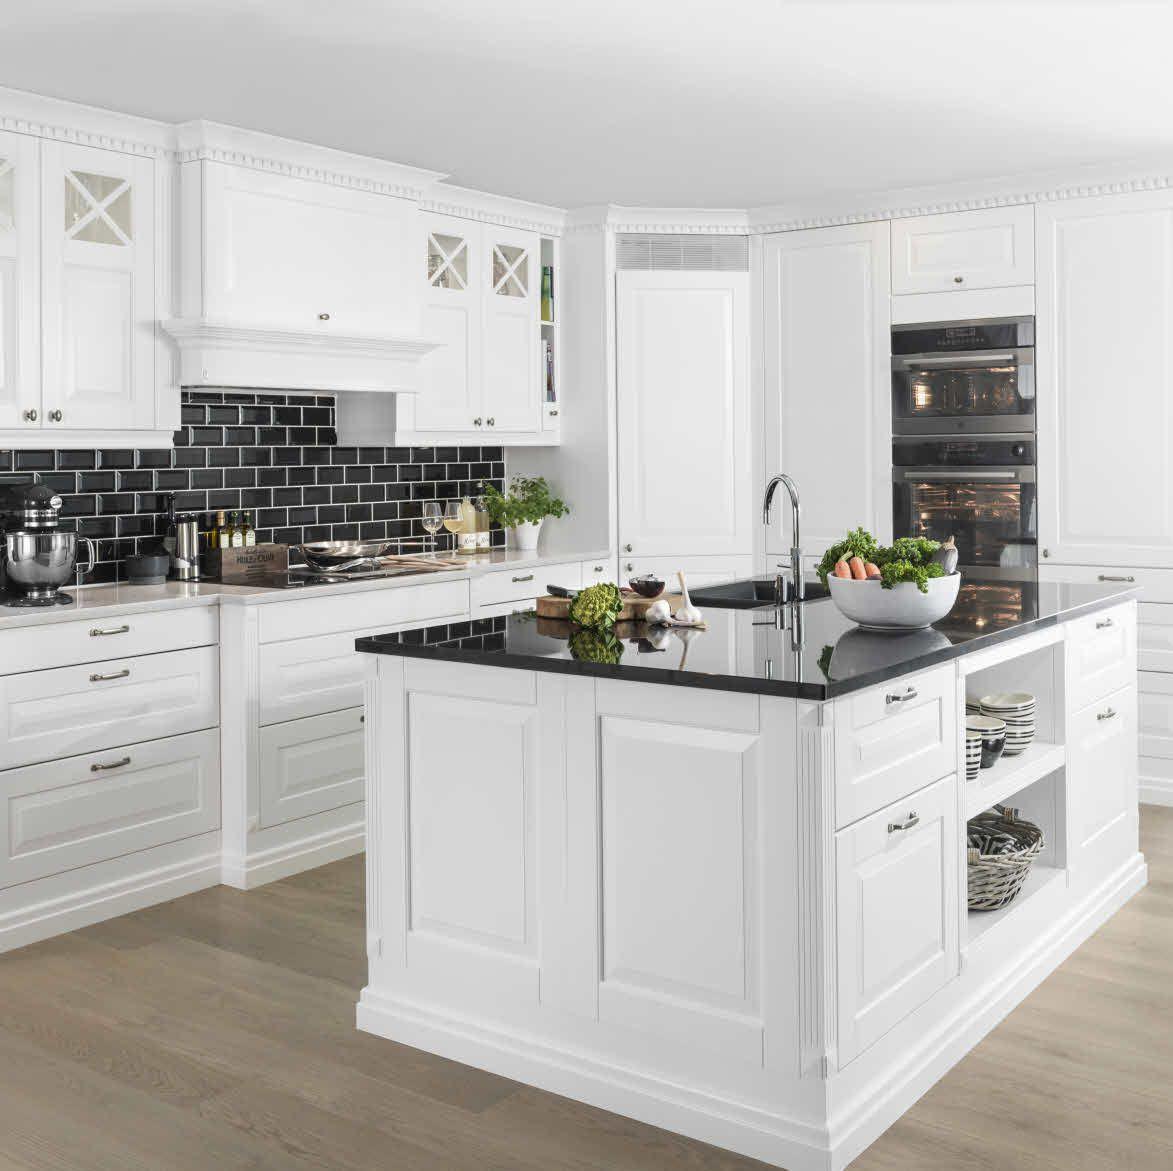 Sigdal kjøkken - Herregaard Premium white | Indoor living ...